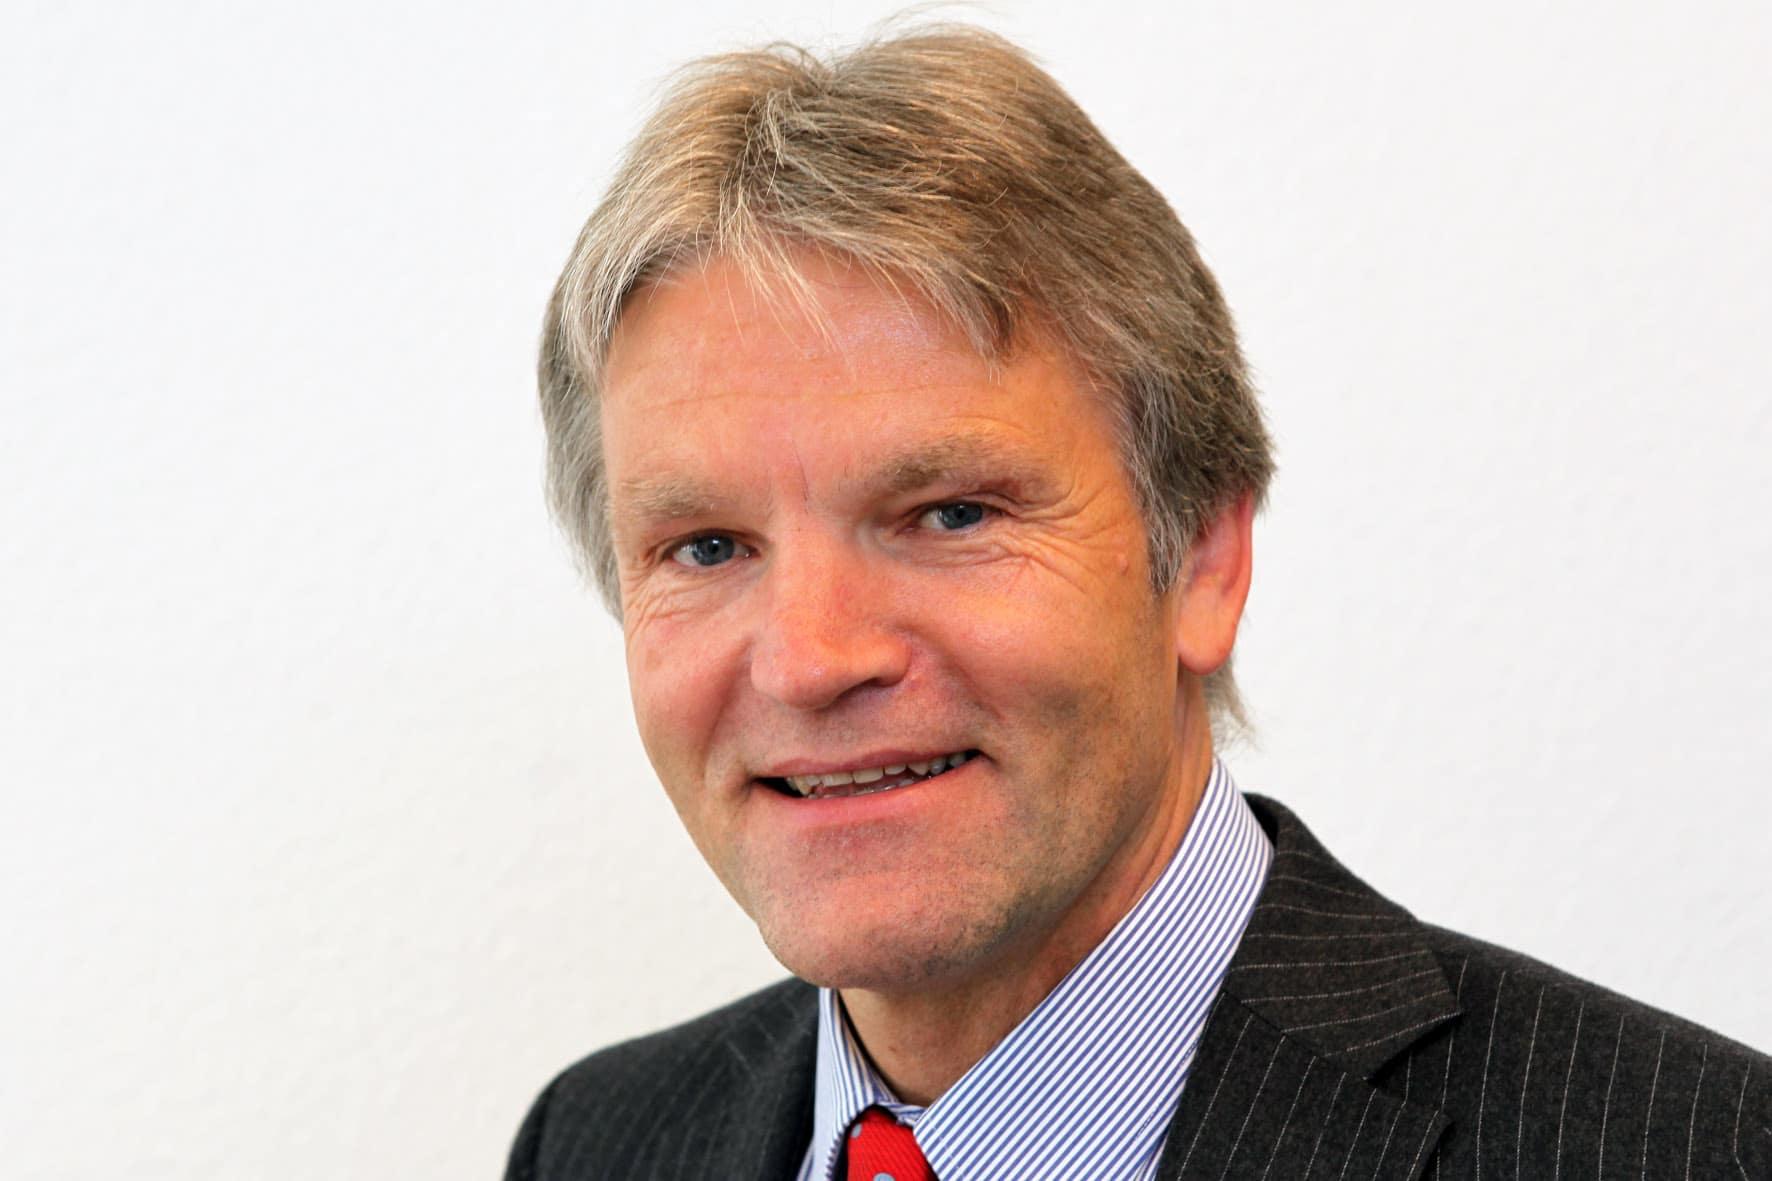 Bernd Kersting